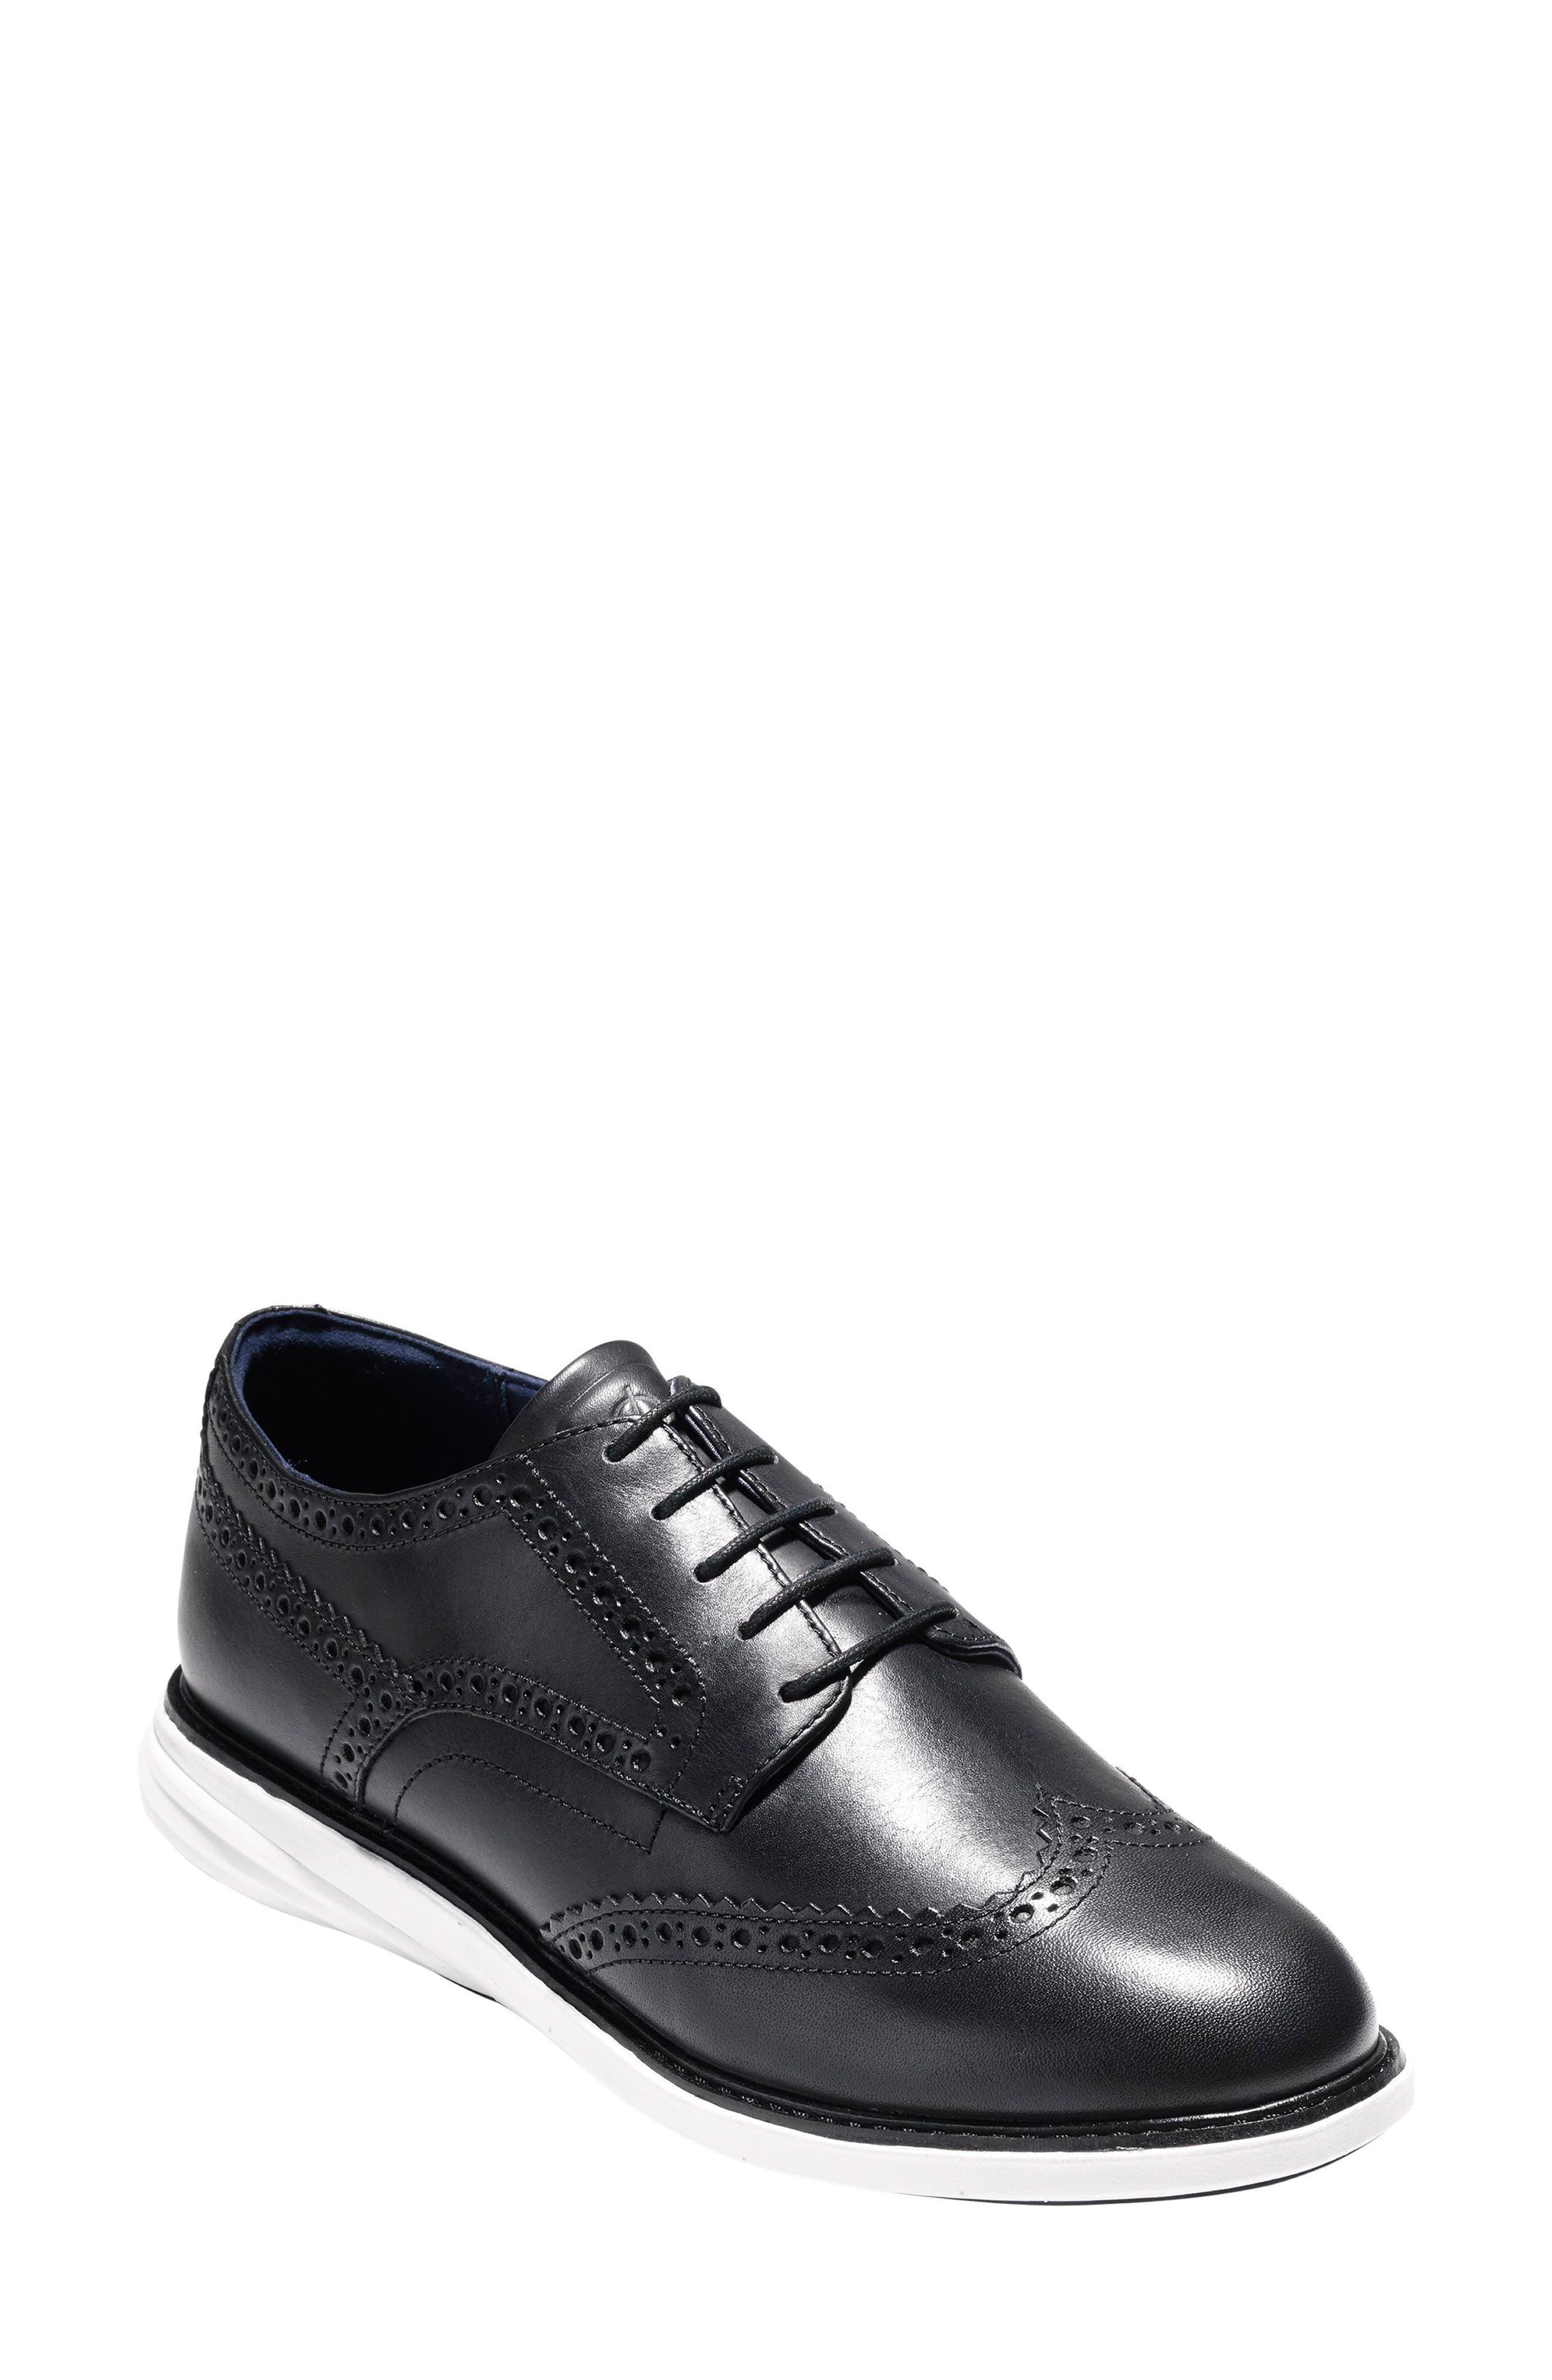 Gradevolution Oxford Sneaker,                         Main,                         color, Black/ Optic White Leather